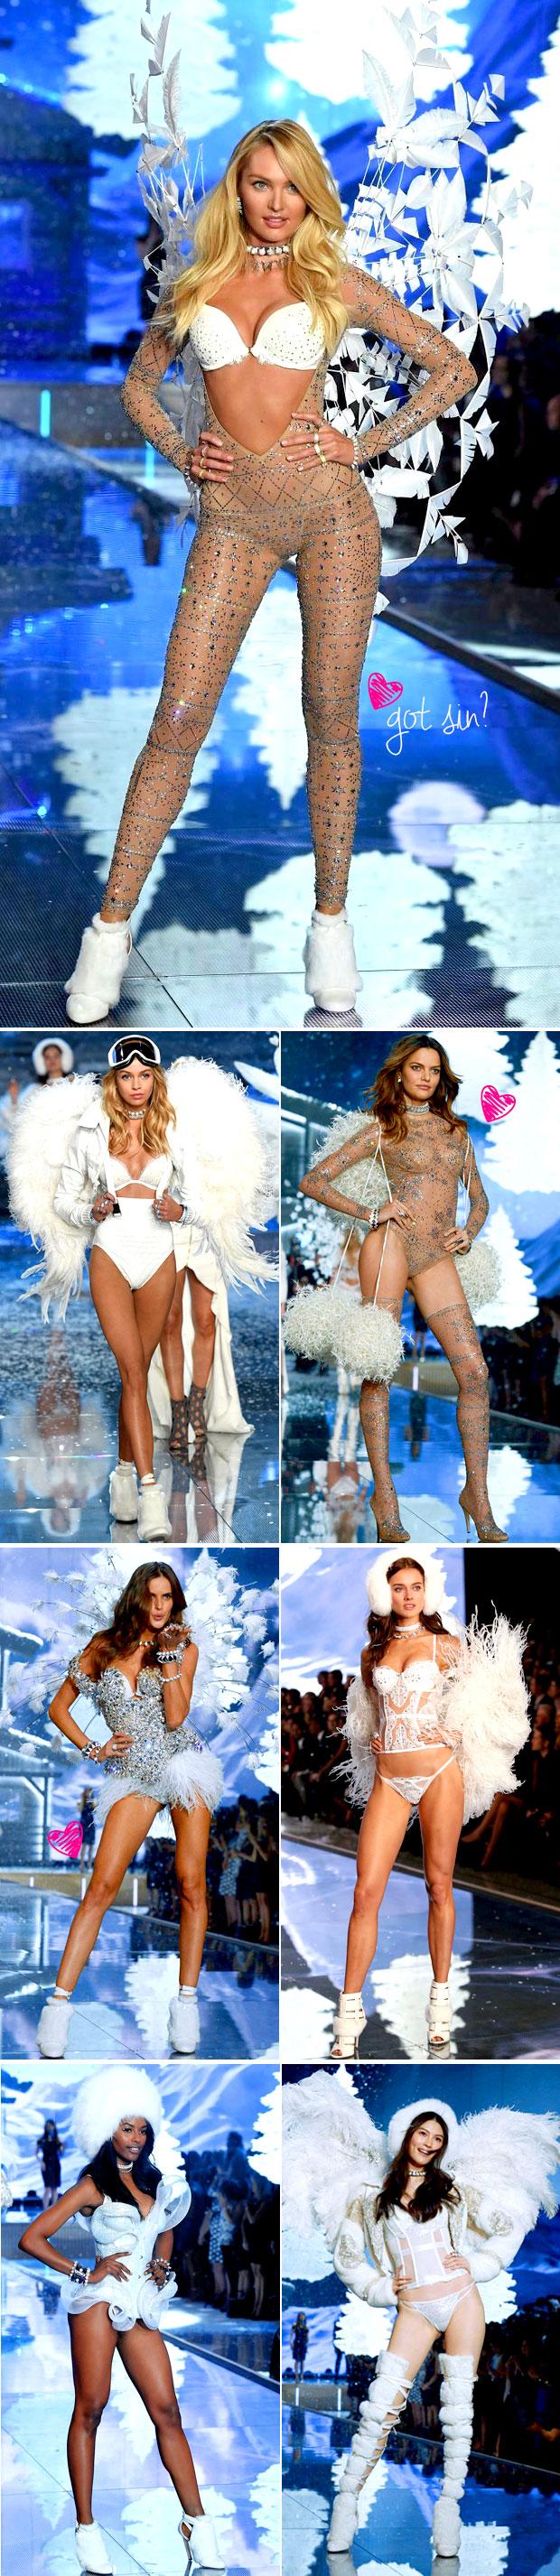 victorias-secret-fashion-show-snow-queens-todas-as-fotos-blog-got-sin-candice-swanepoel-barbara-fialho-01